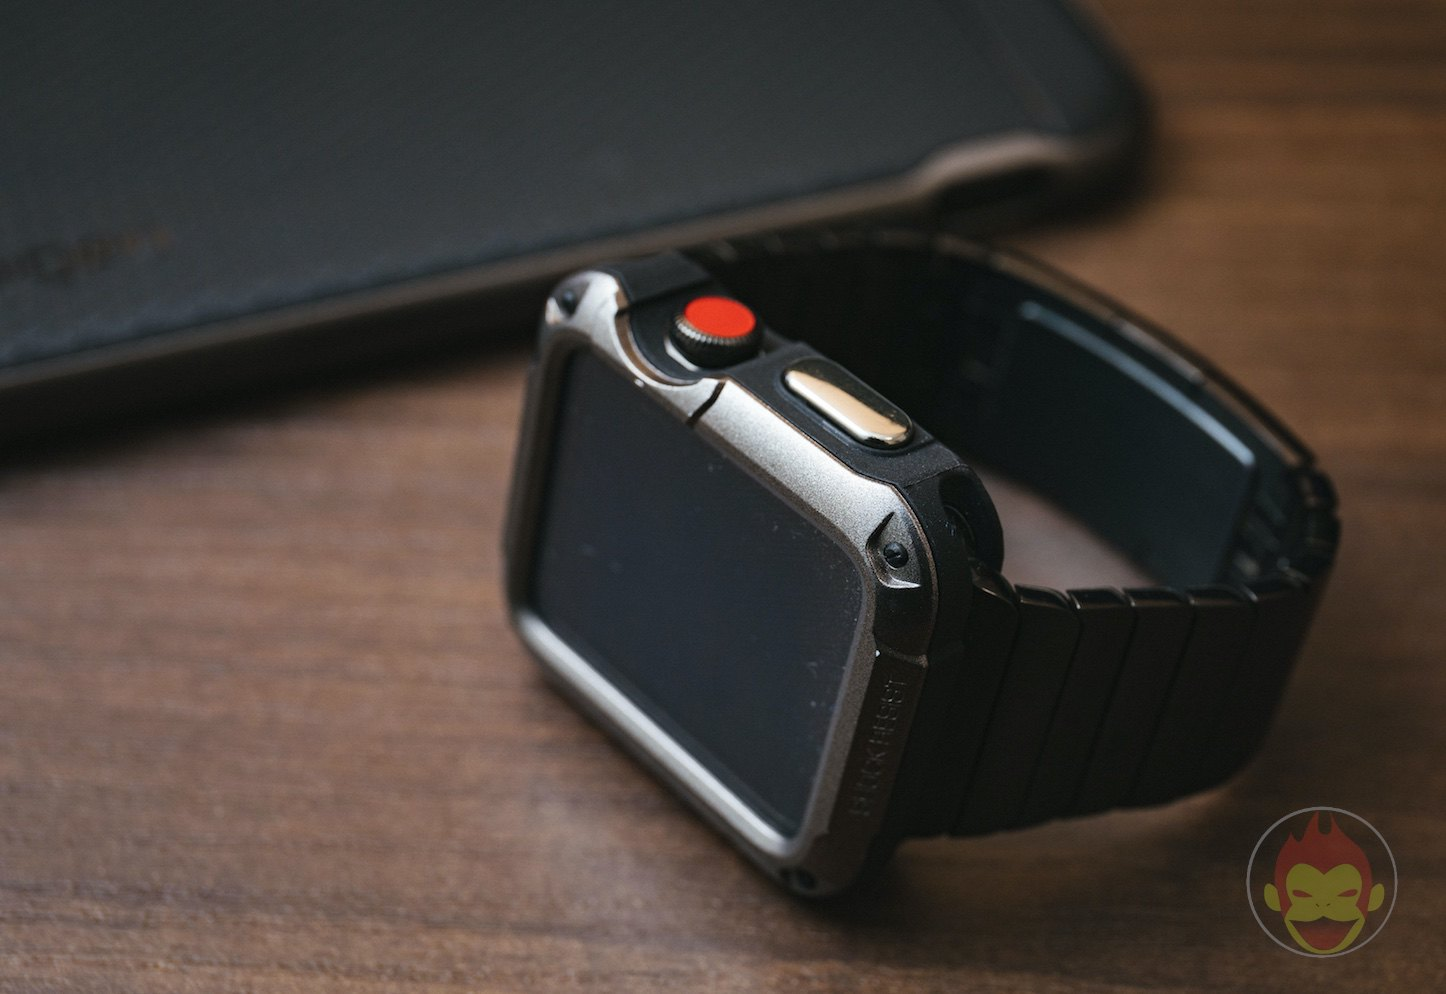 Spigen-Touch-Armor-Apple-Watch-Case-01.jpg